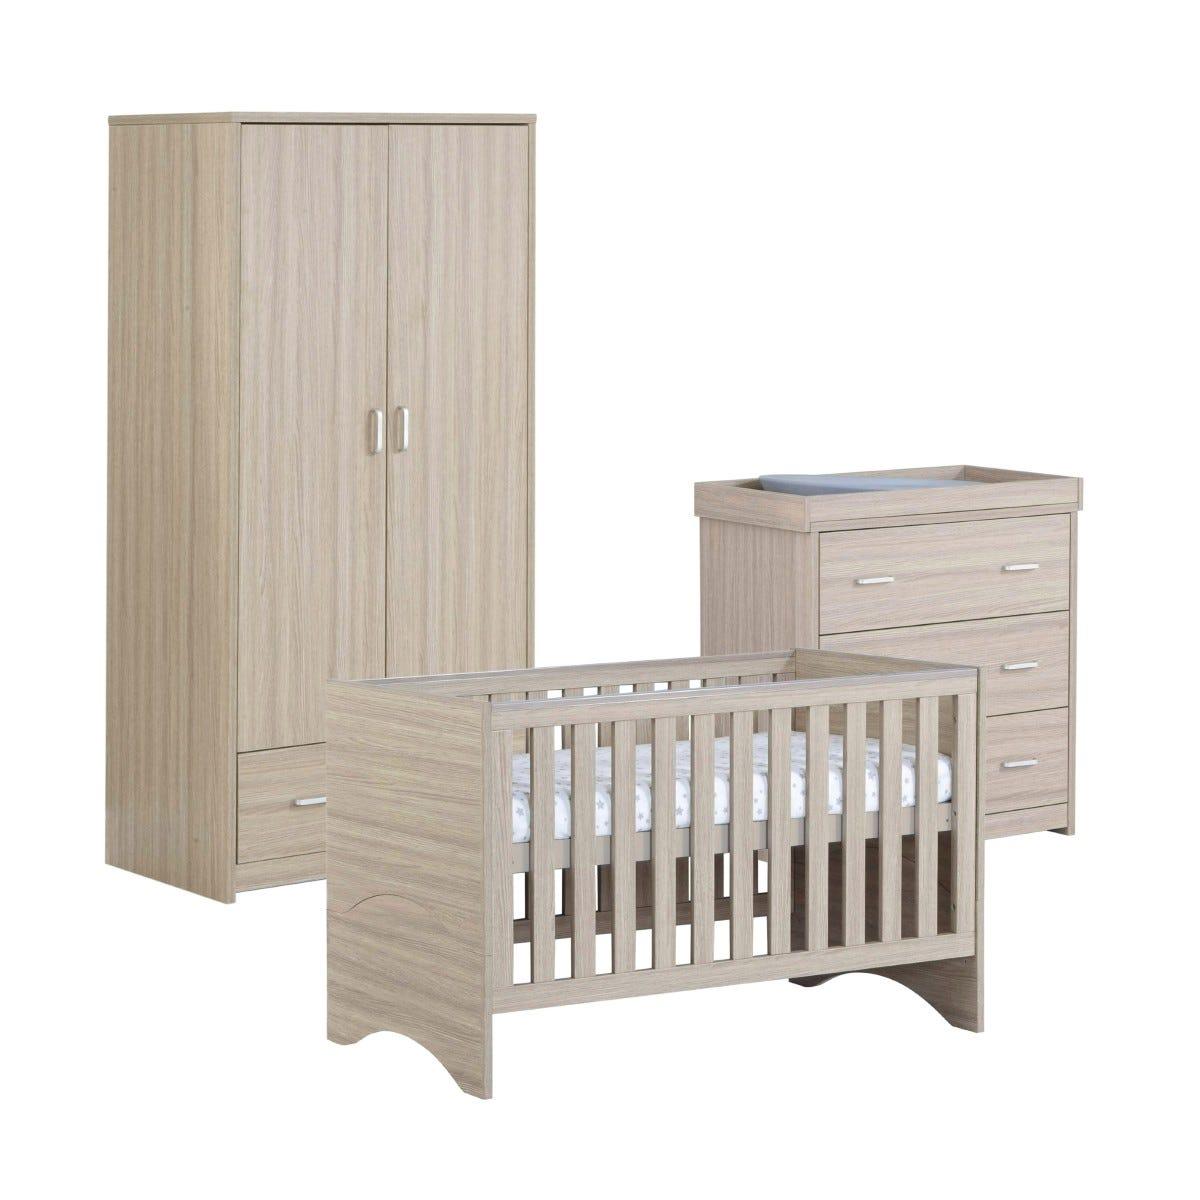 Babymore Veni Oak Effect 3 Piece Set Cot Bed Chest Changer and Wardrobe